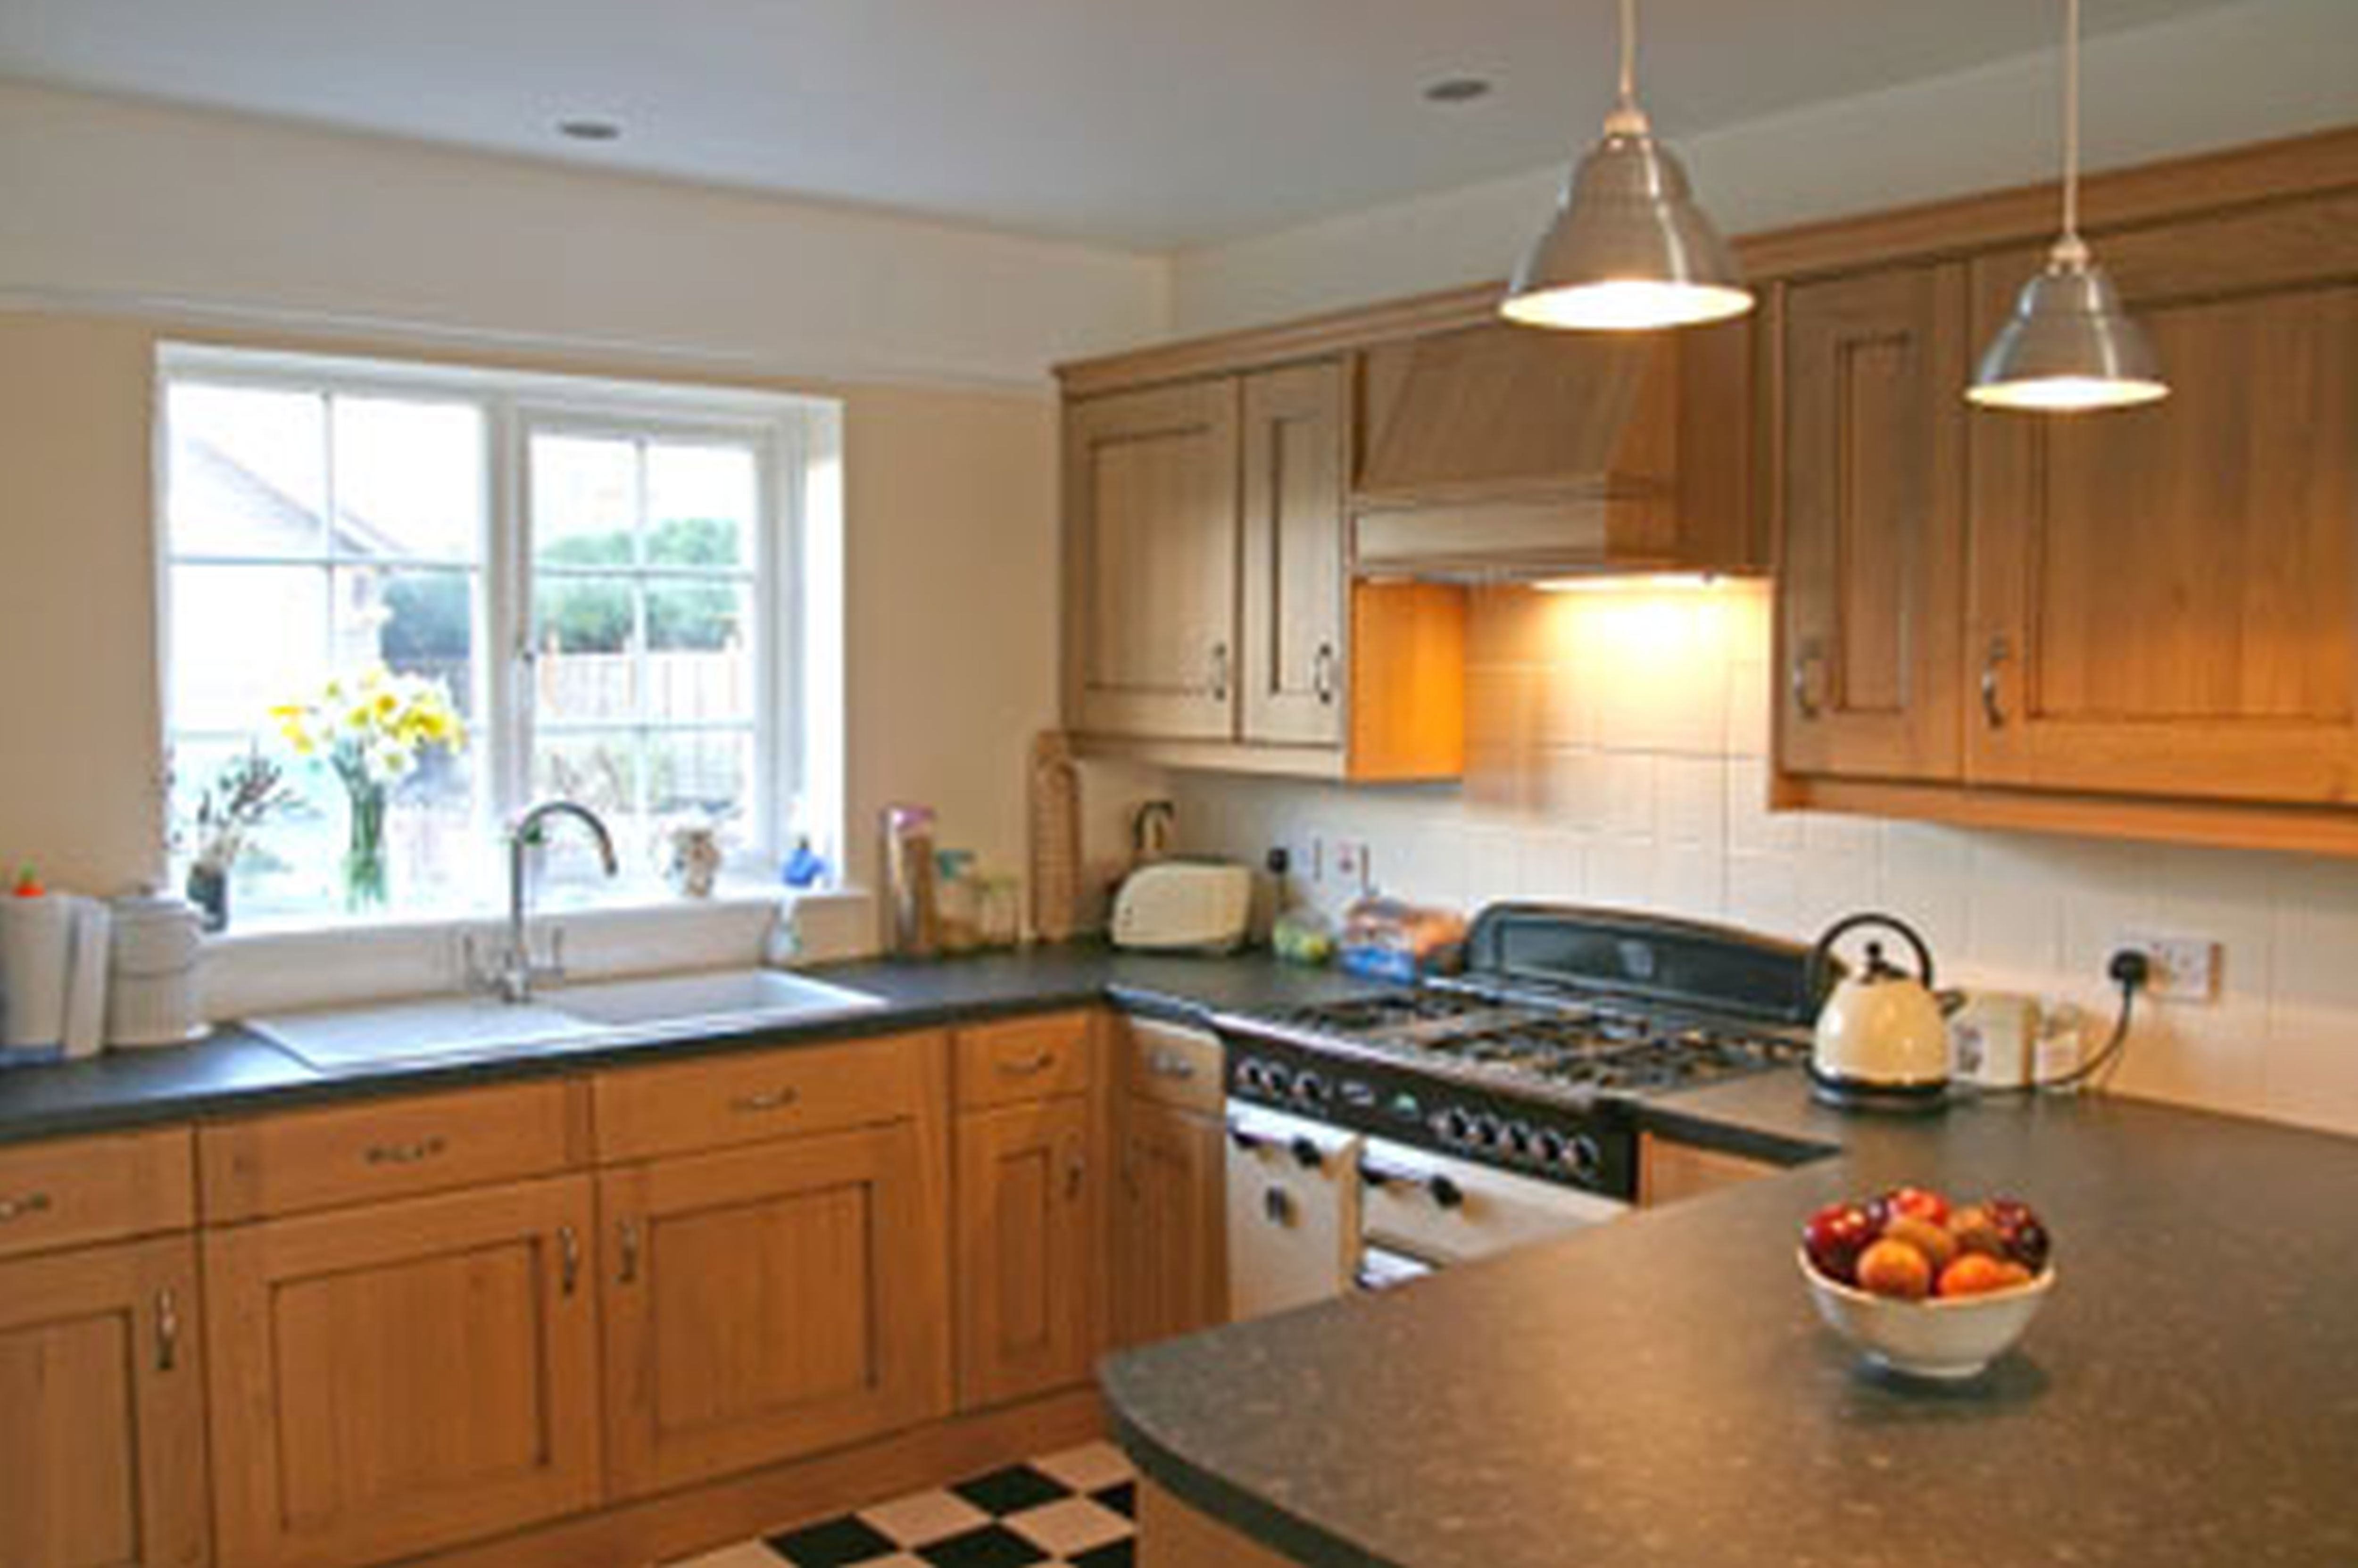 Best U Shaped Kitchen Design & Decoration Ideas  Kitchen Design Endearing Kitchen Design For U Shaped Layouts Review